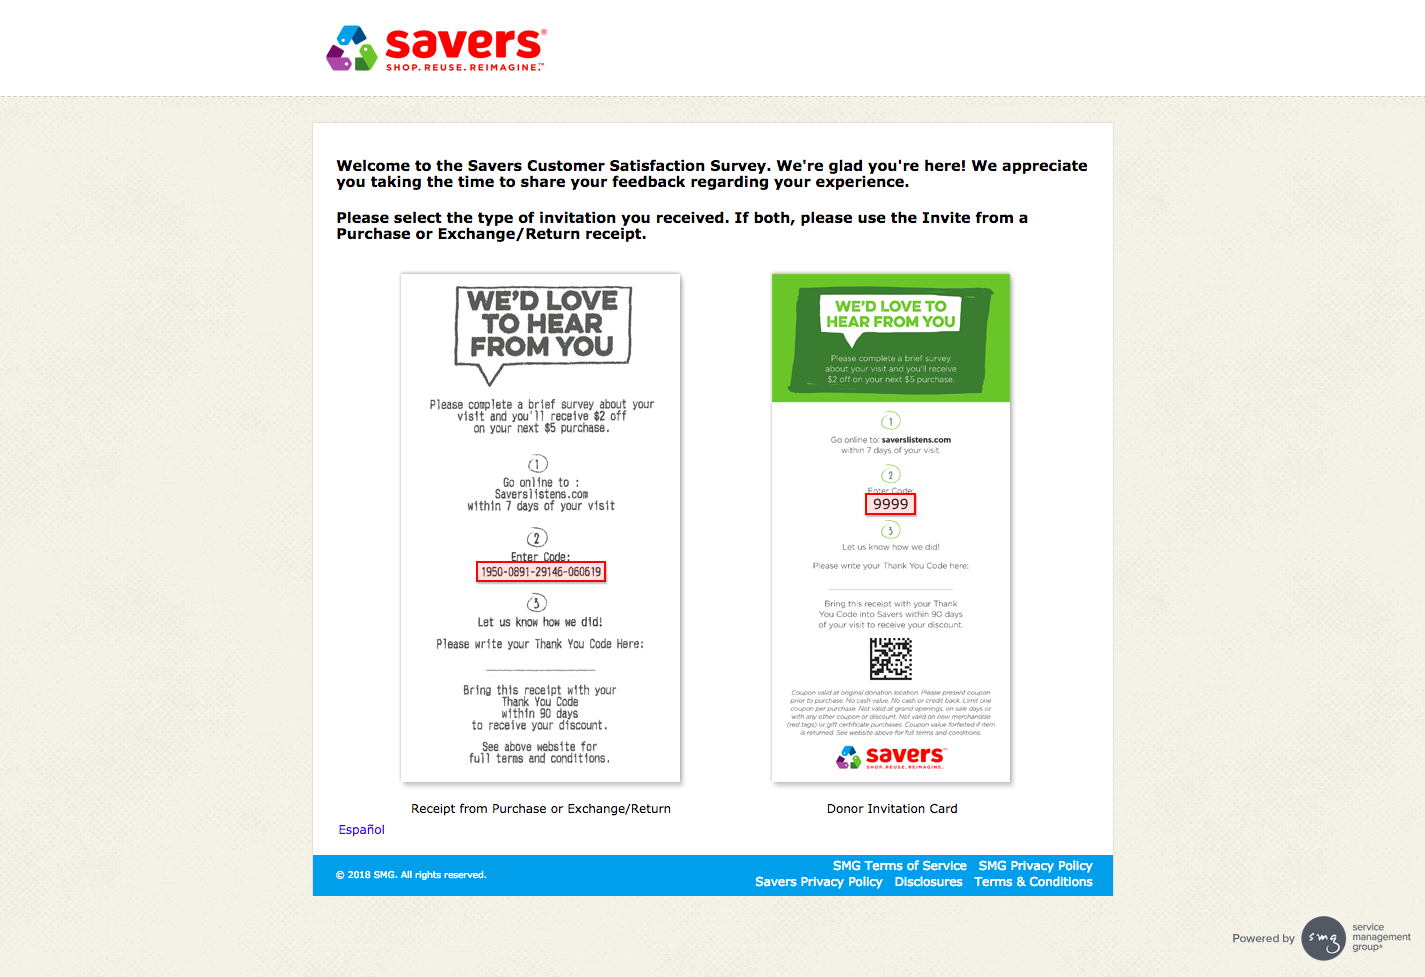 savers listens